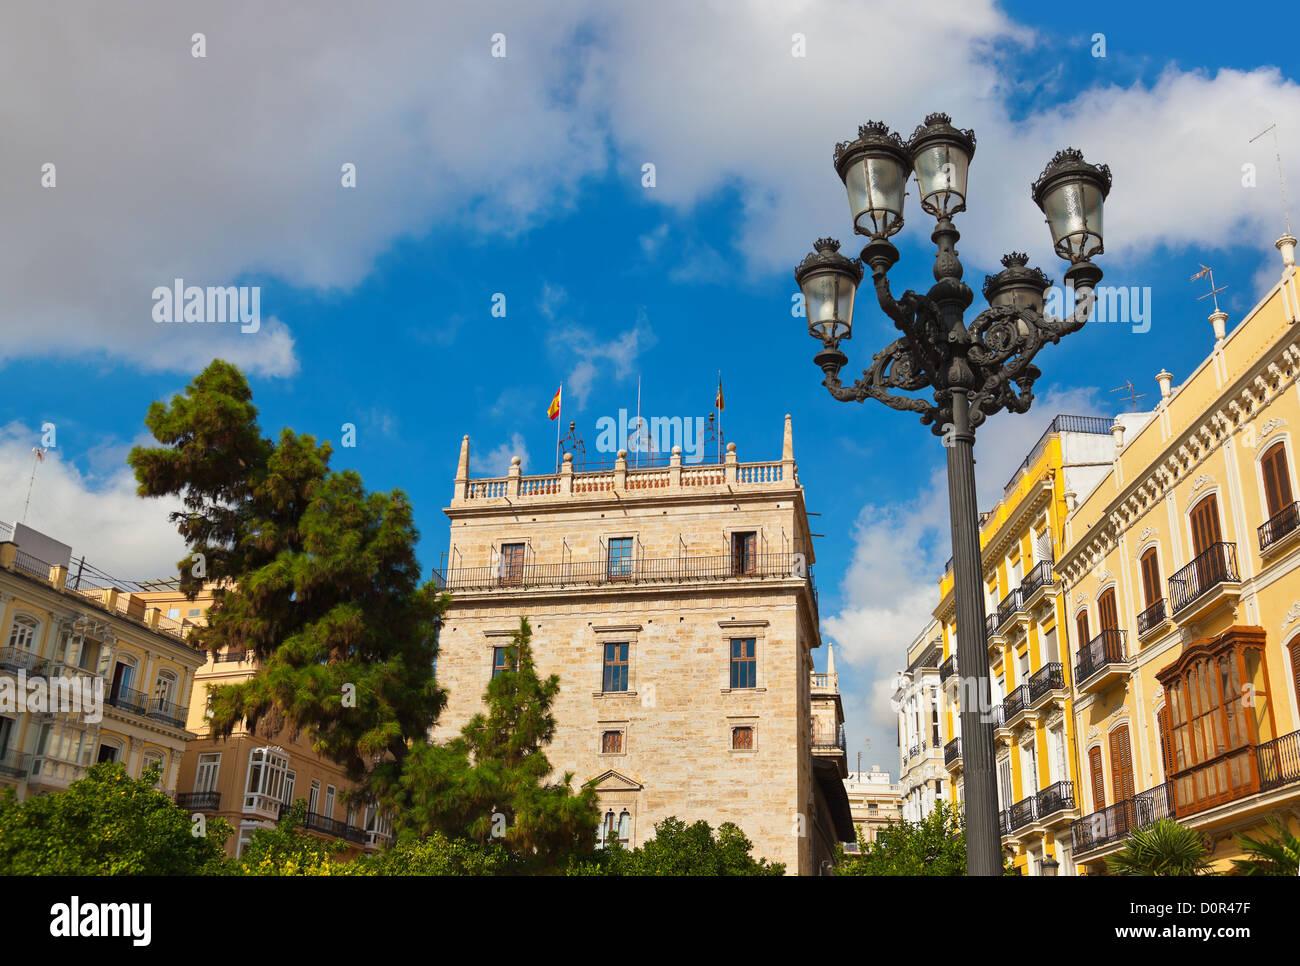 Plaza de la Reina - Valencia Spain Stock Photo